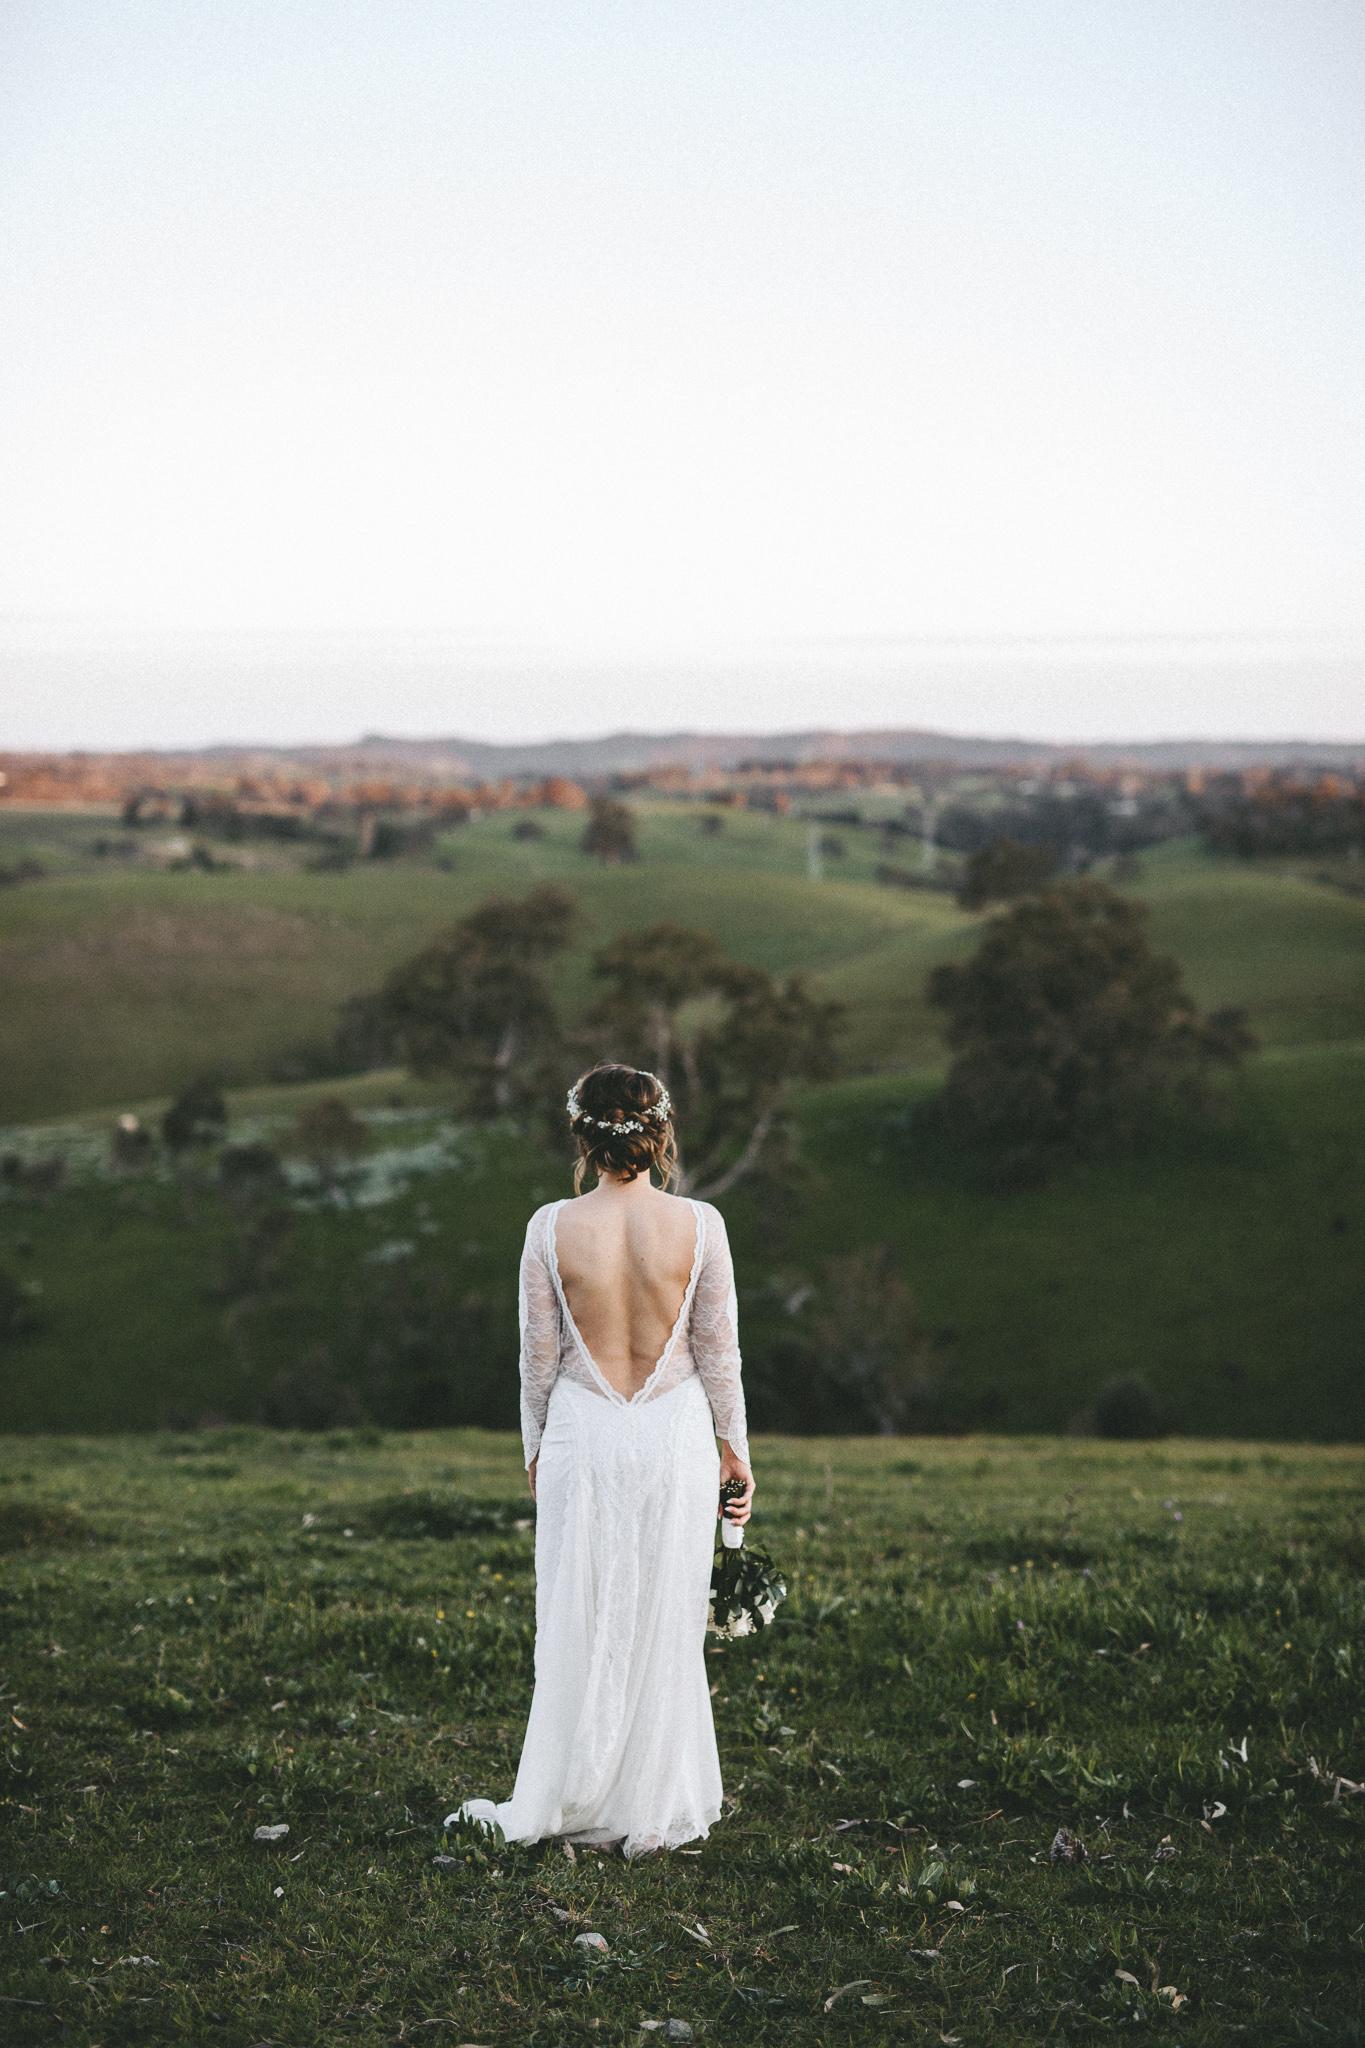 christopher morrison_adelaide hills wedding_ andy + teegan_95_1139.jpg